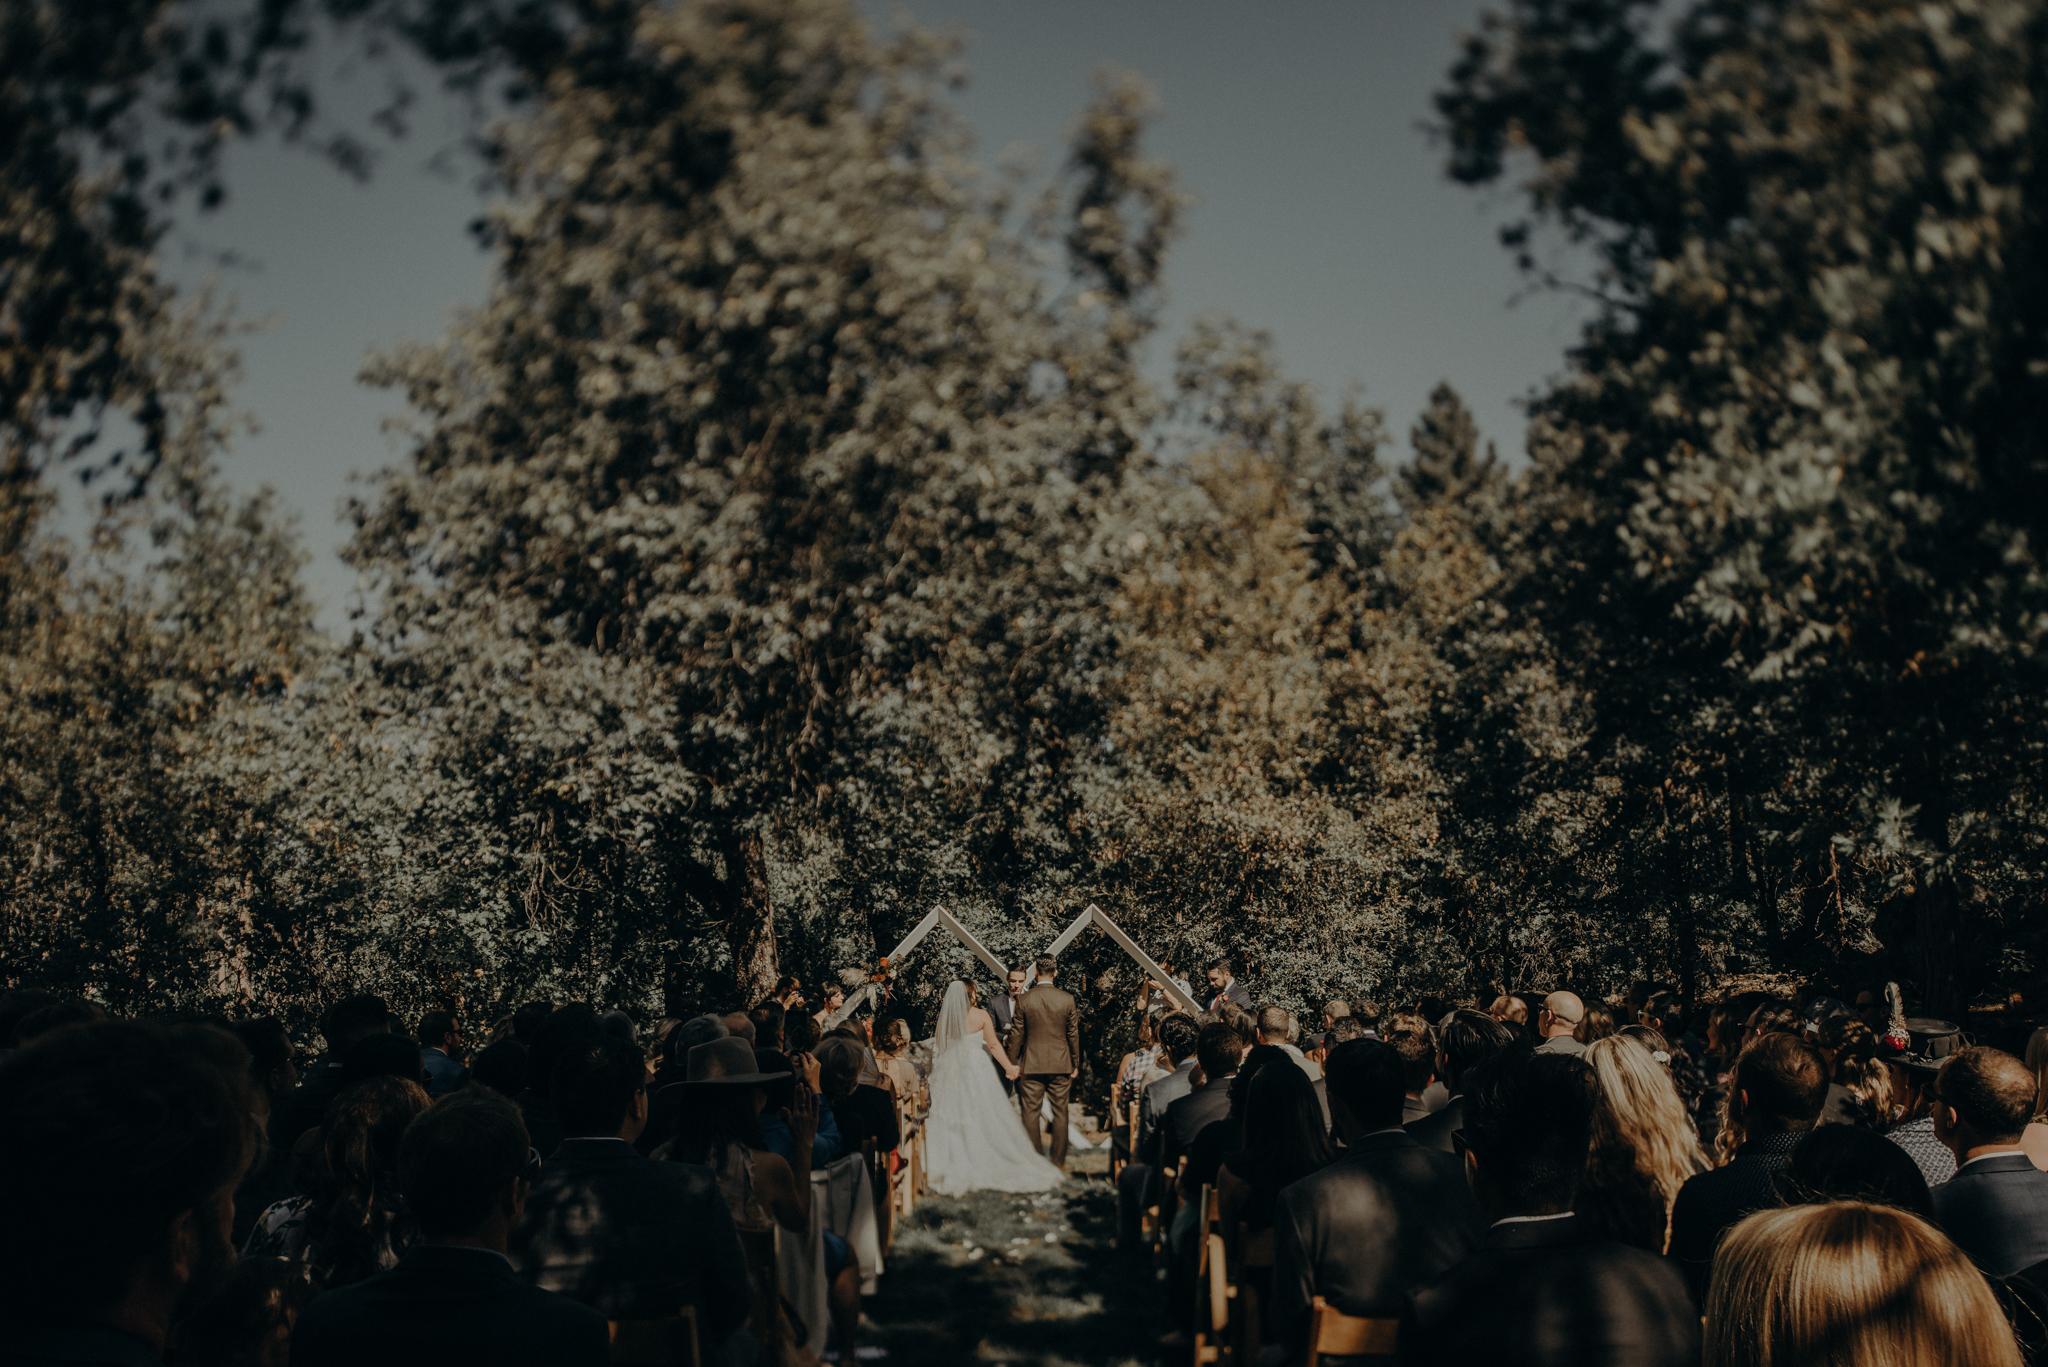 Yosemite Elopement Photographer - Evergreen Lodge Wedding Photographer - IsaiahAndTaylor.com-095.jpg